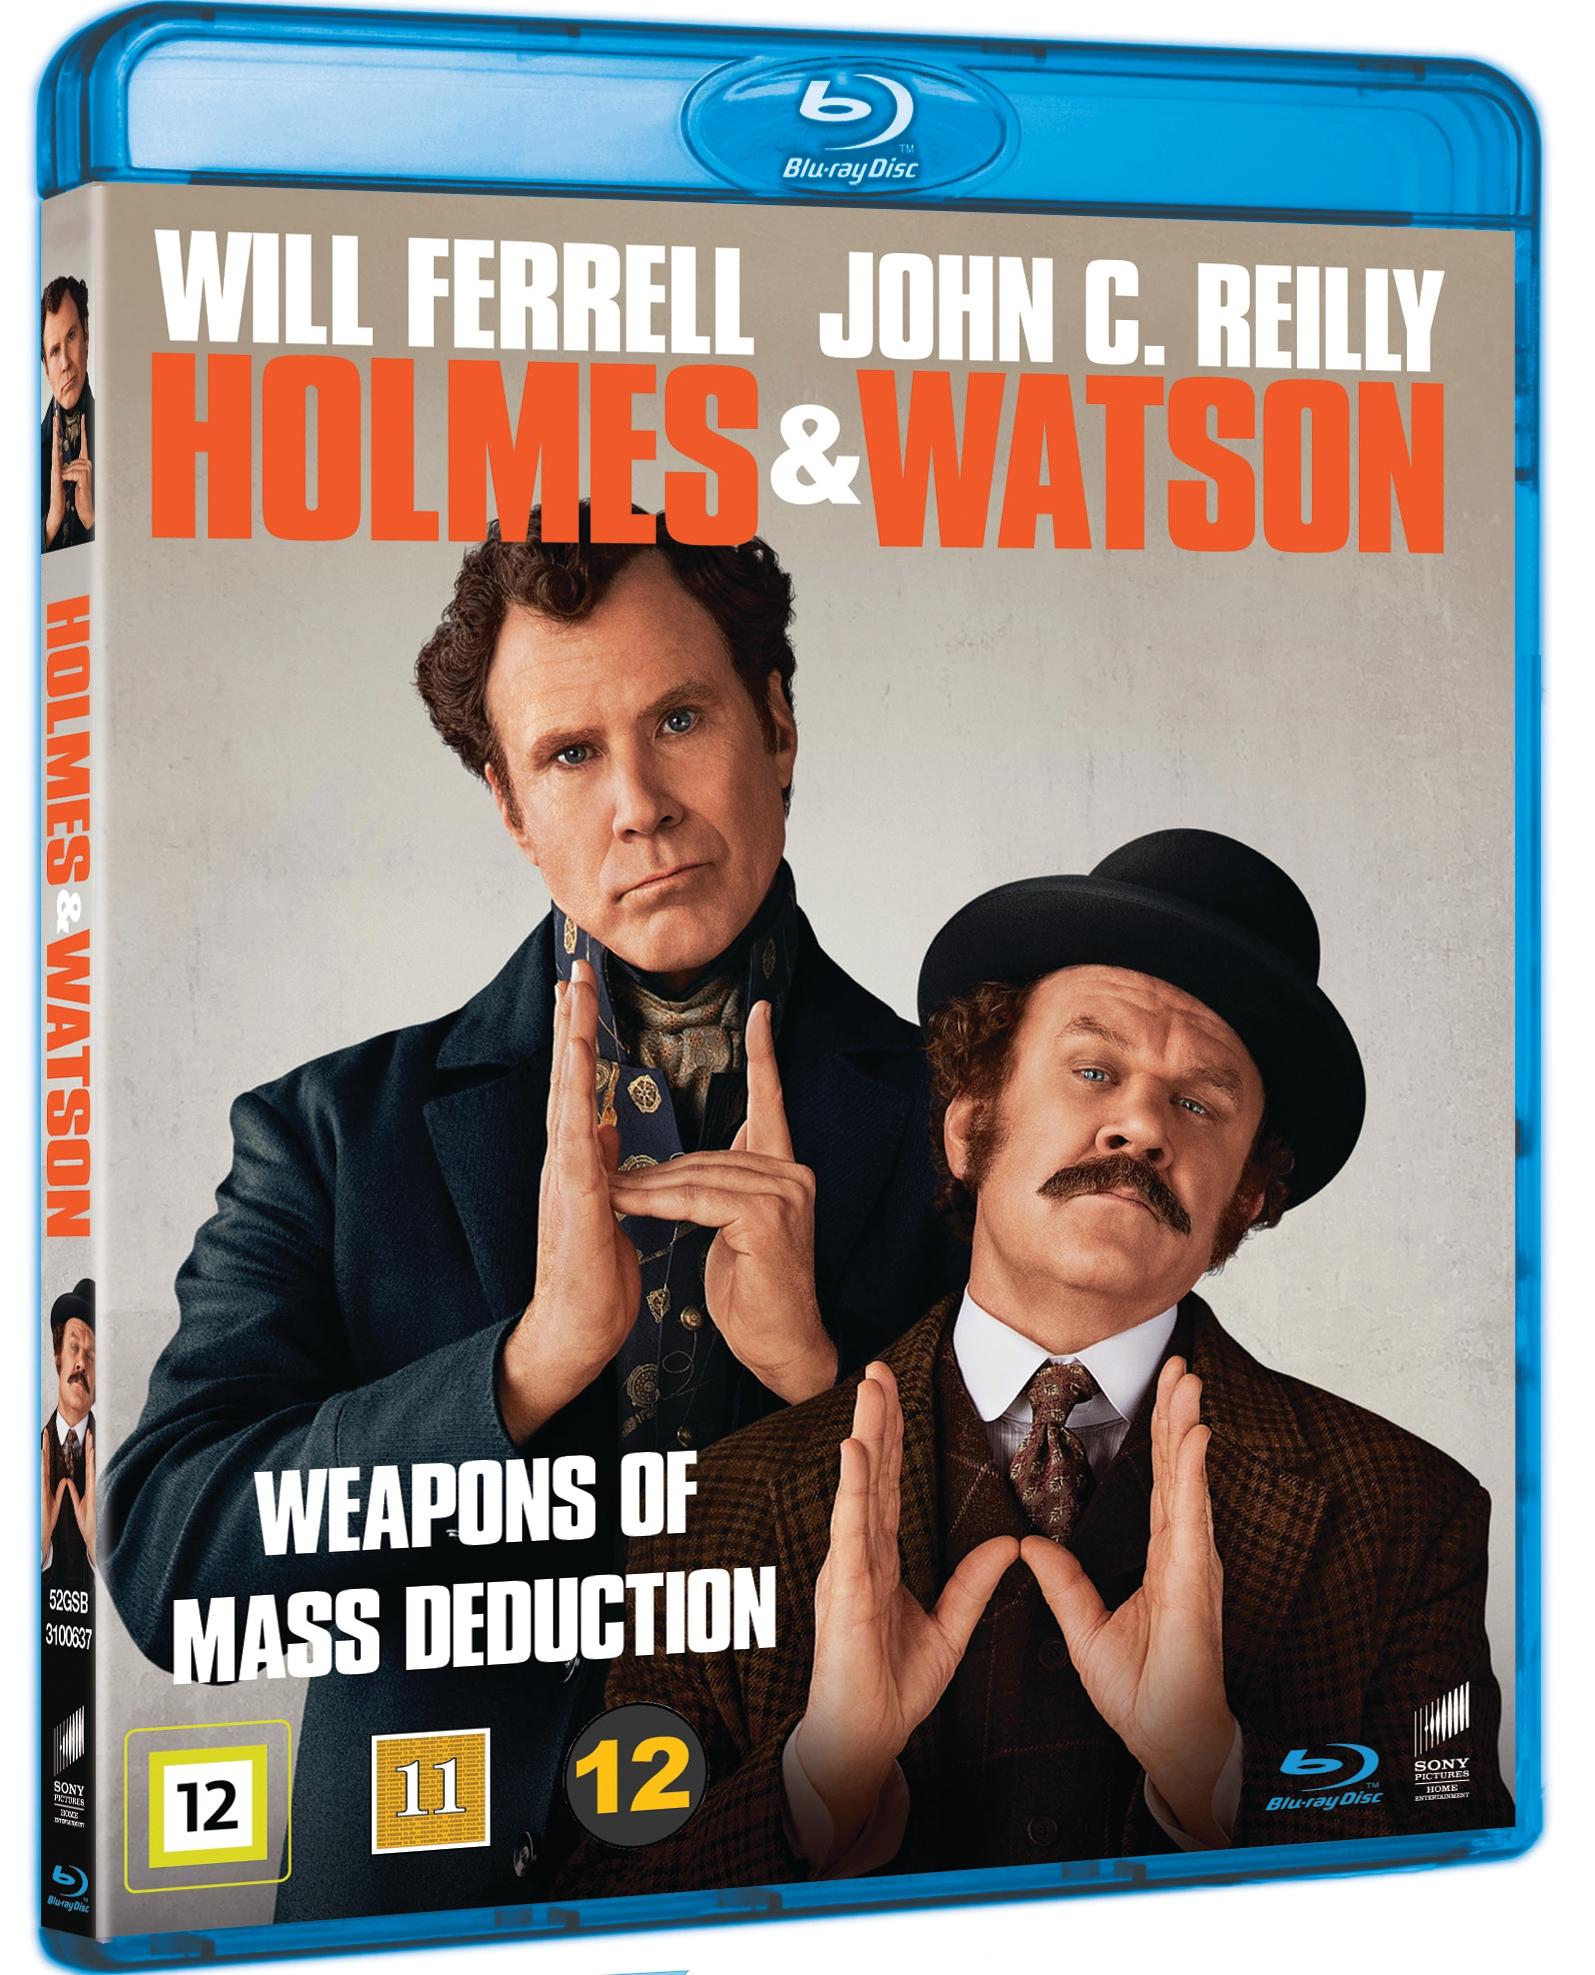 Holmes & Watson Blu ray